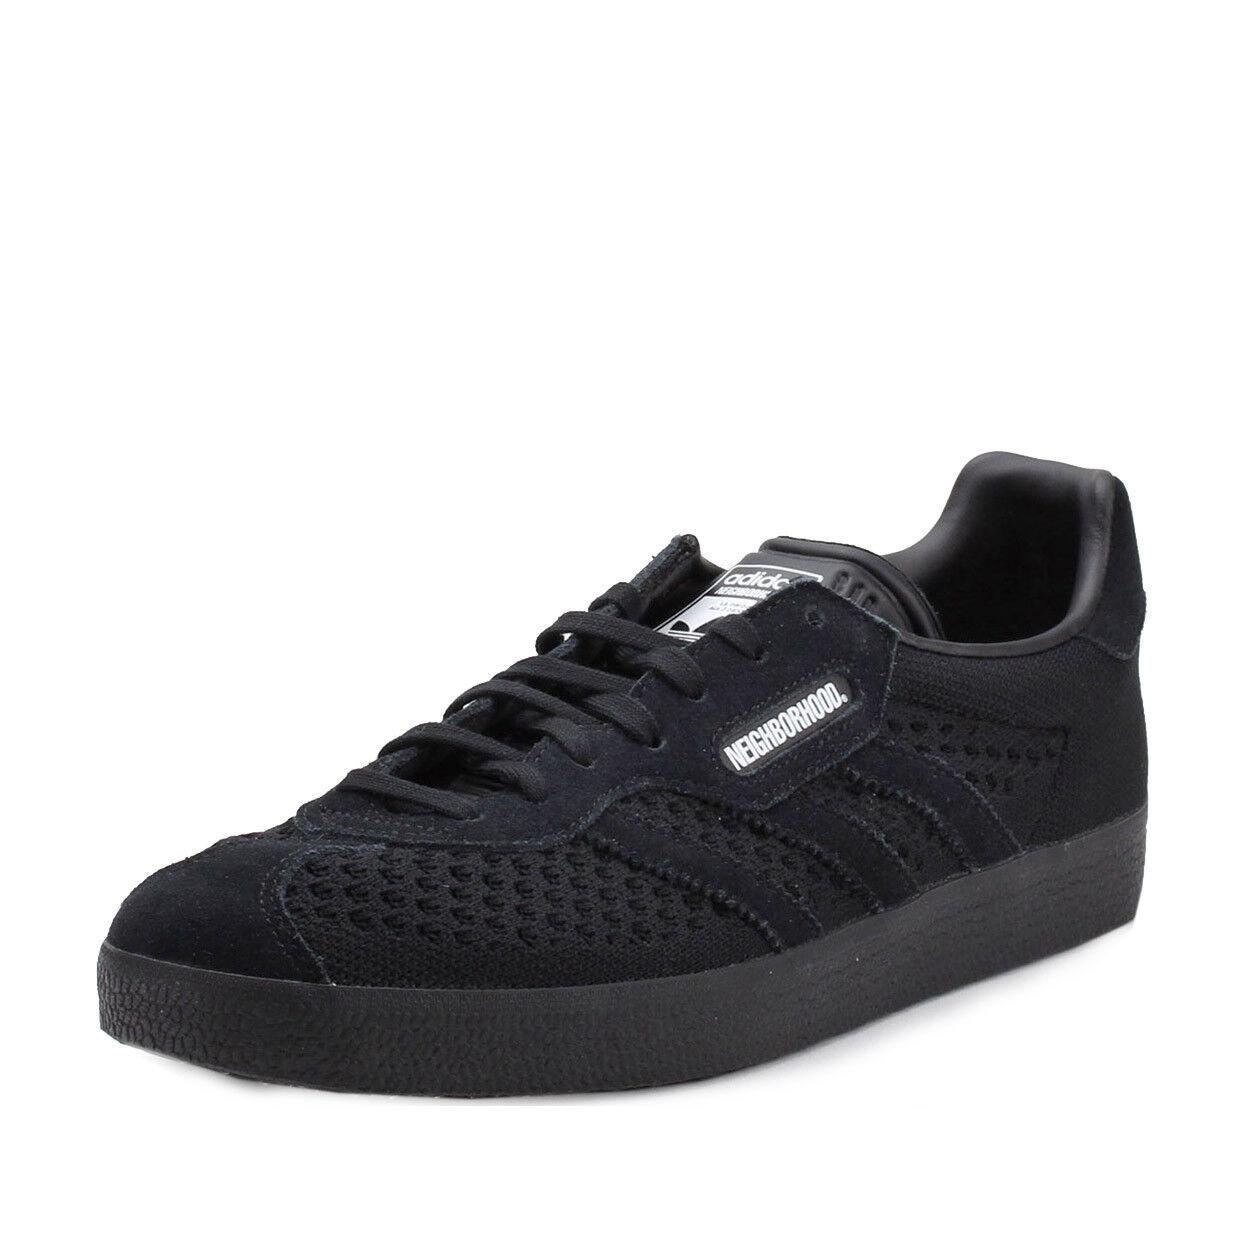 Adidas Para Hombre Gacela Super NBHD Barrio Negro Negro Barrio DA8836 5d4ff3